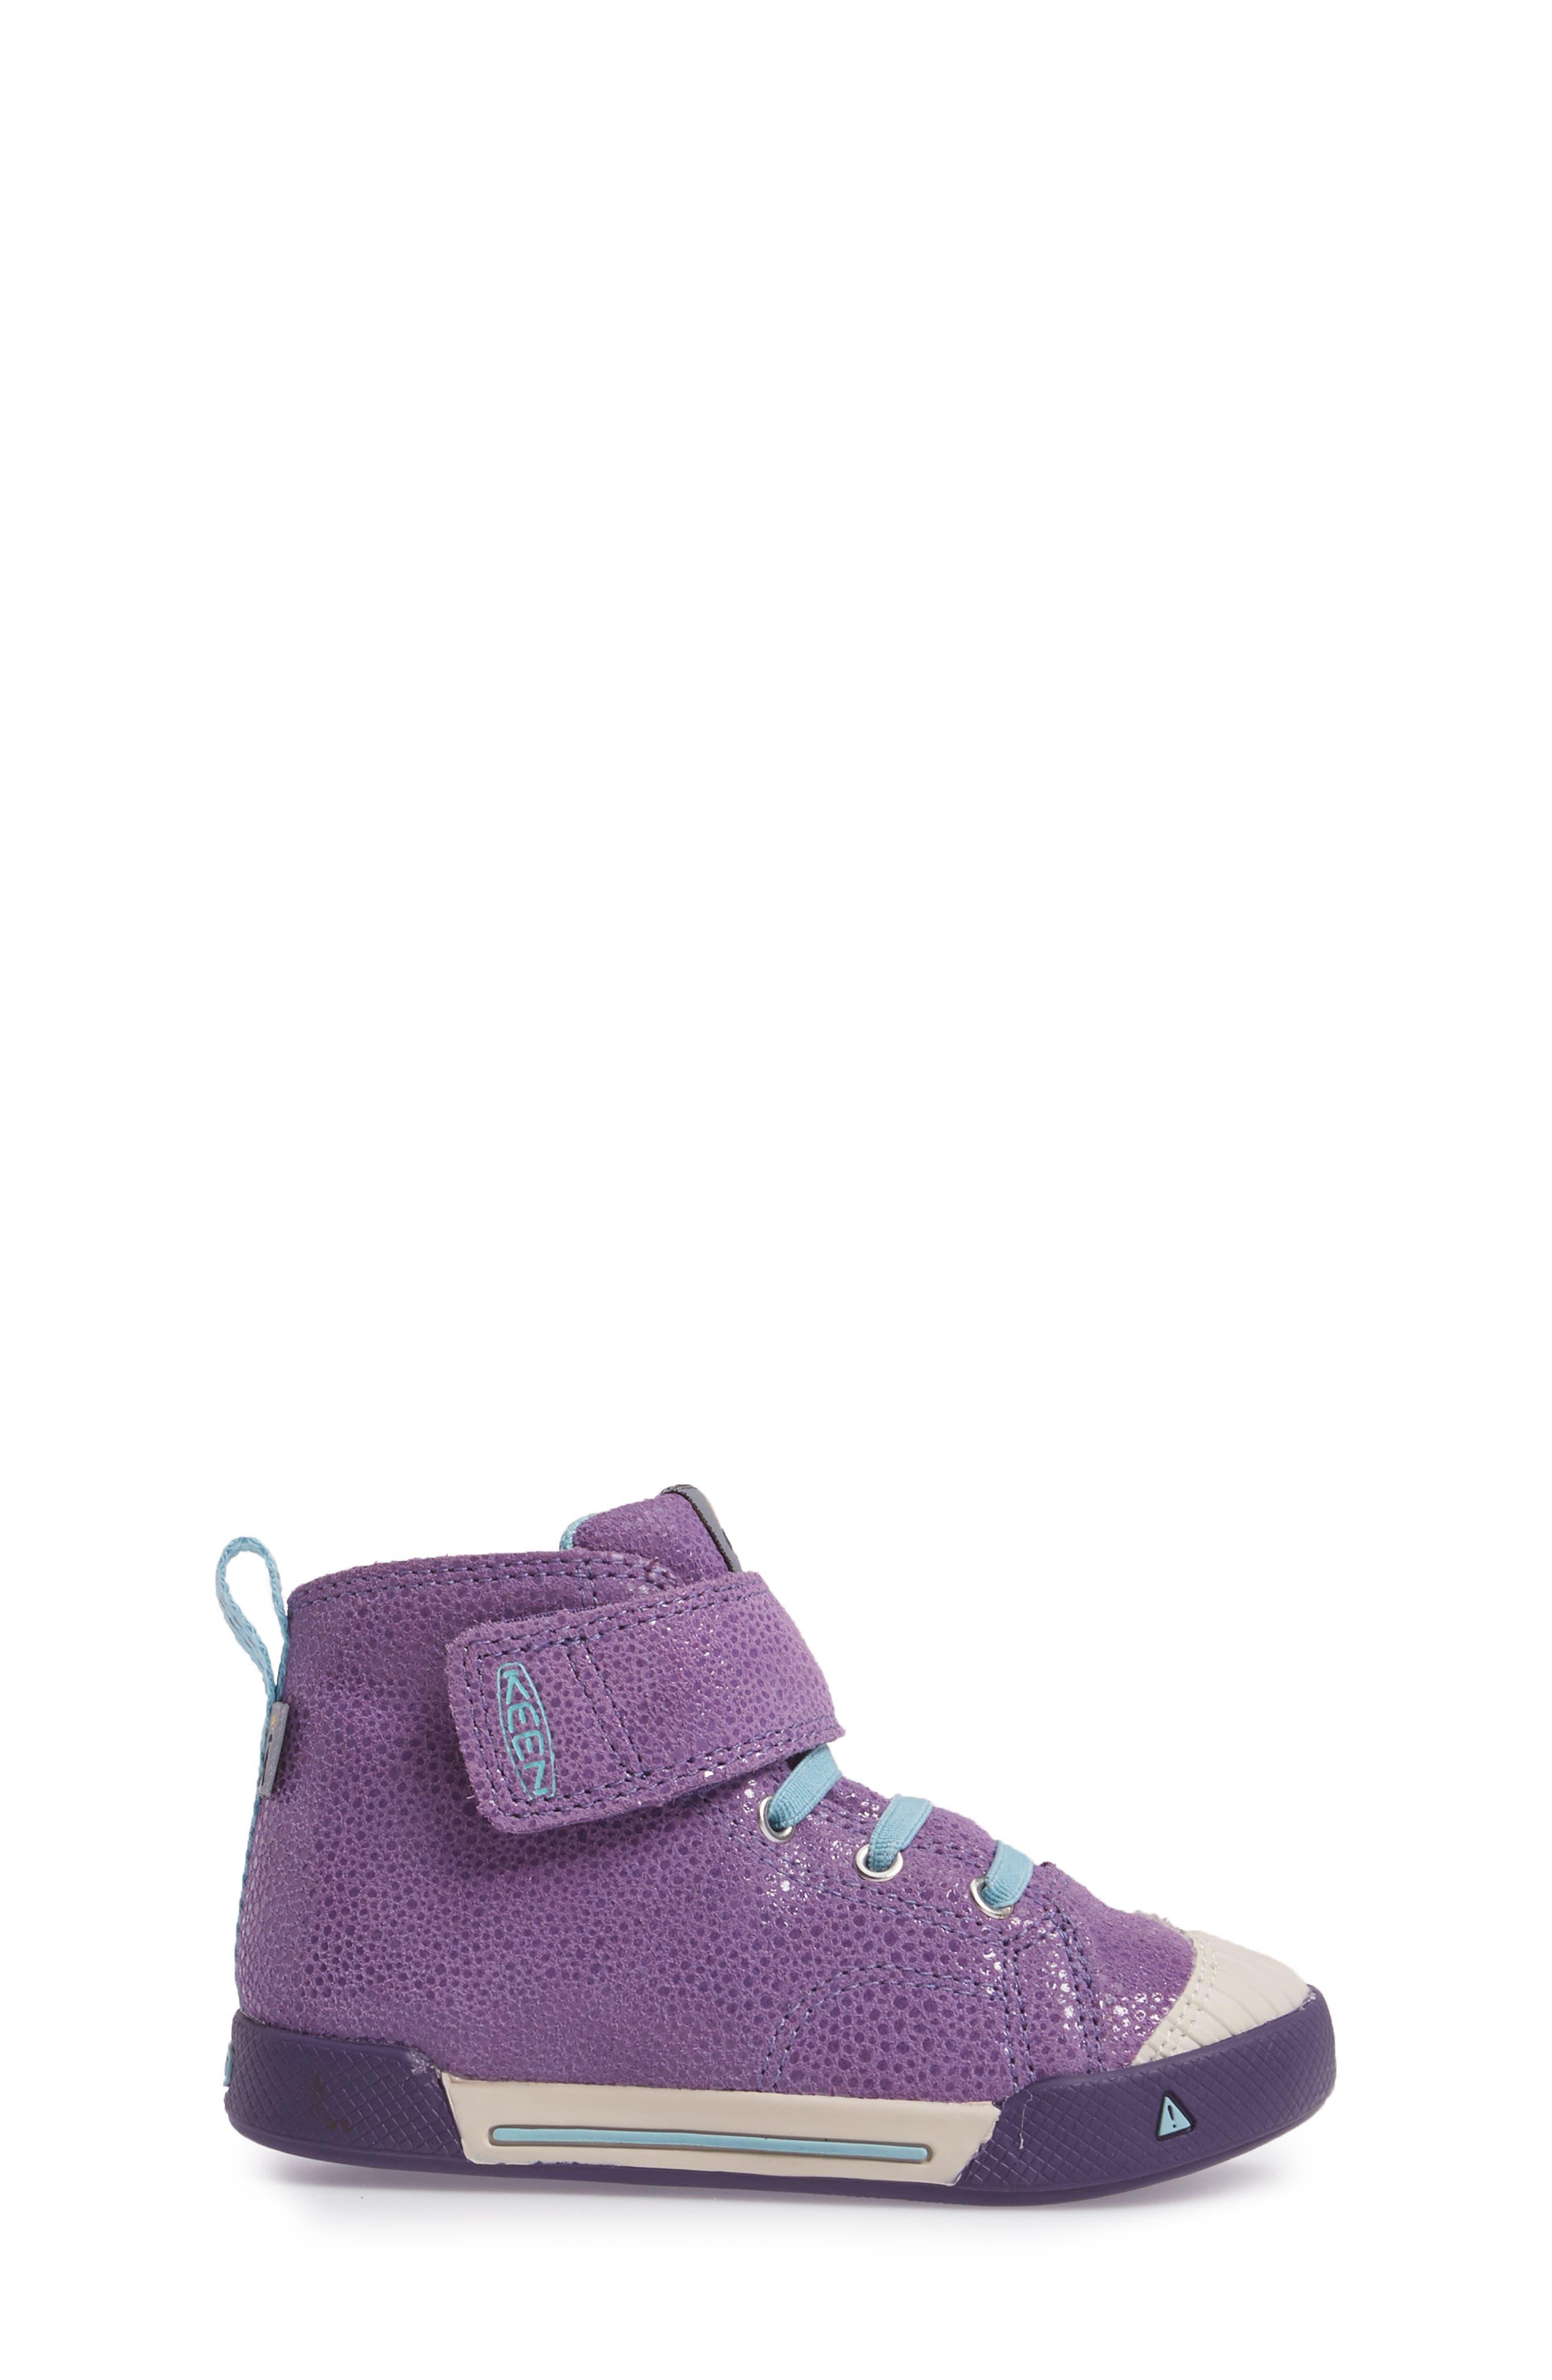 Alternate Image 3  - Keen 'Encanto Scout' High Top Sneaker (Baby, Walker, Toddler & Little Kid)